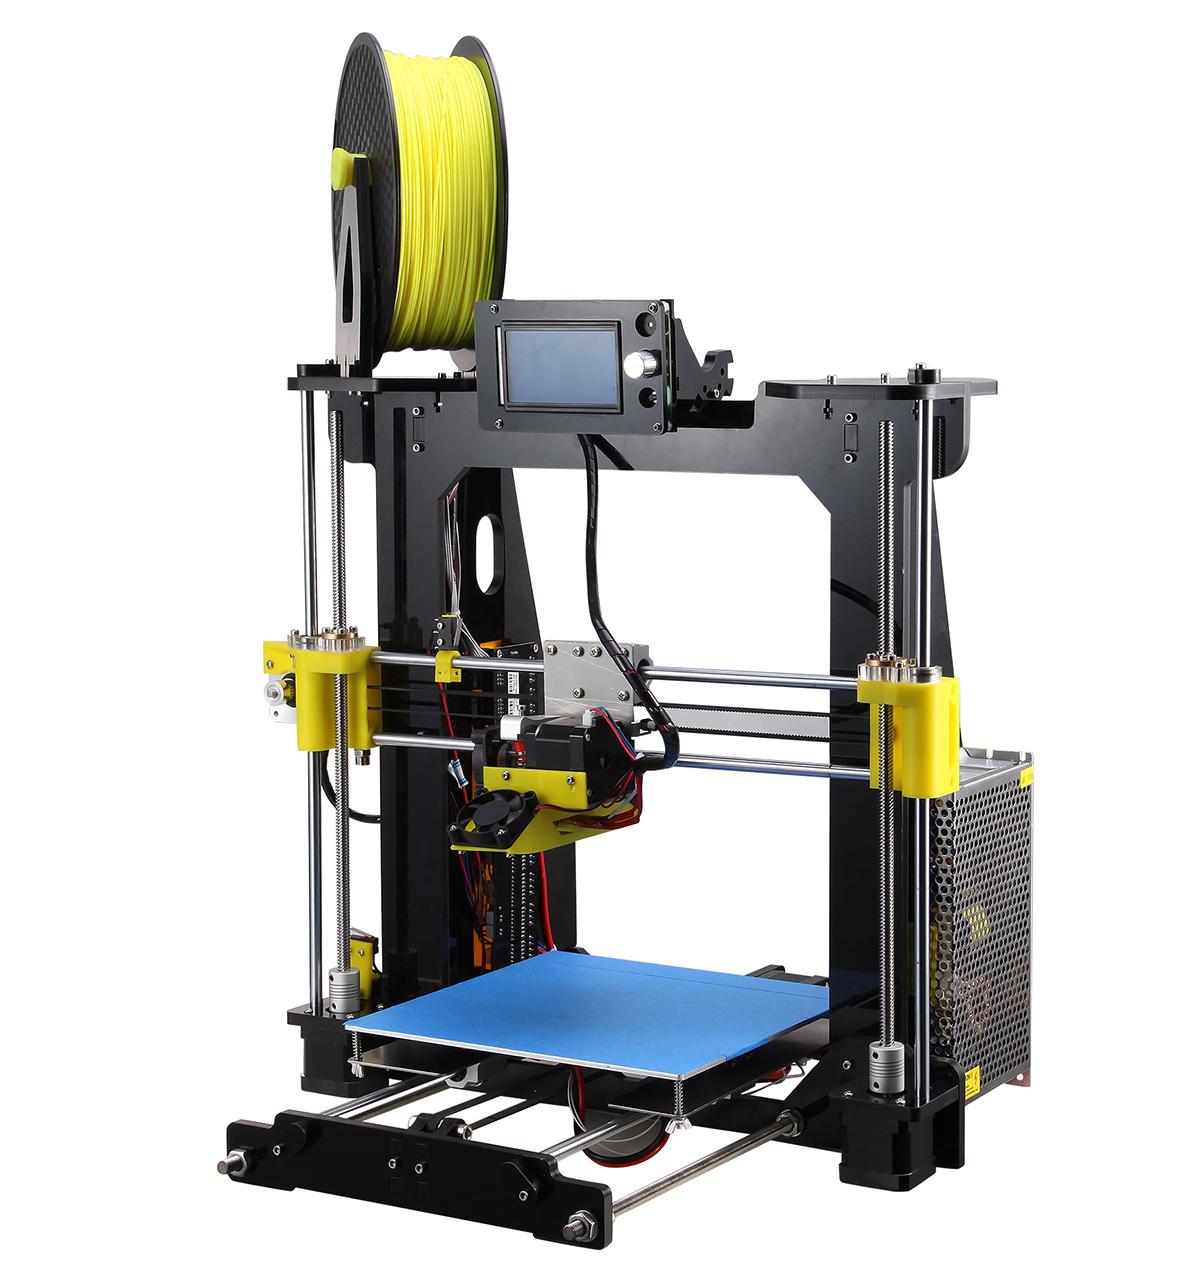 2017 High Performance Rapid Prototype DIY Desktop Fdm 3D Printer